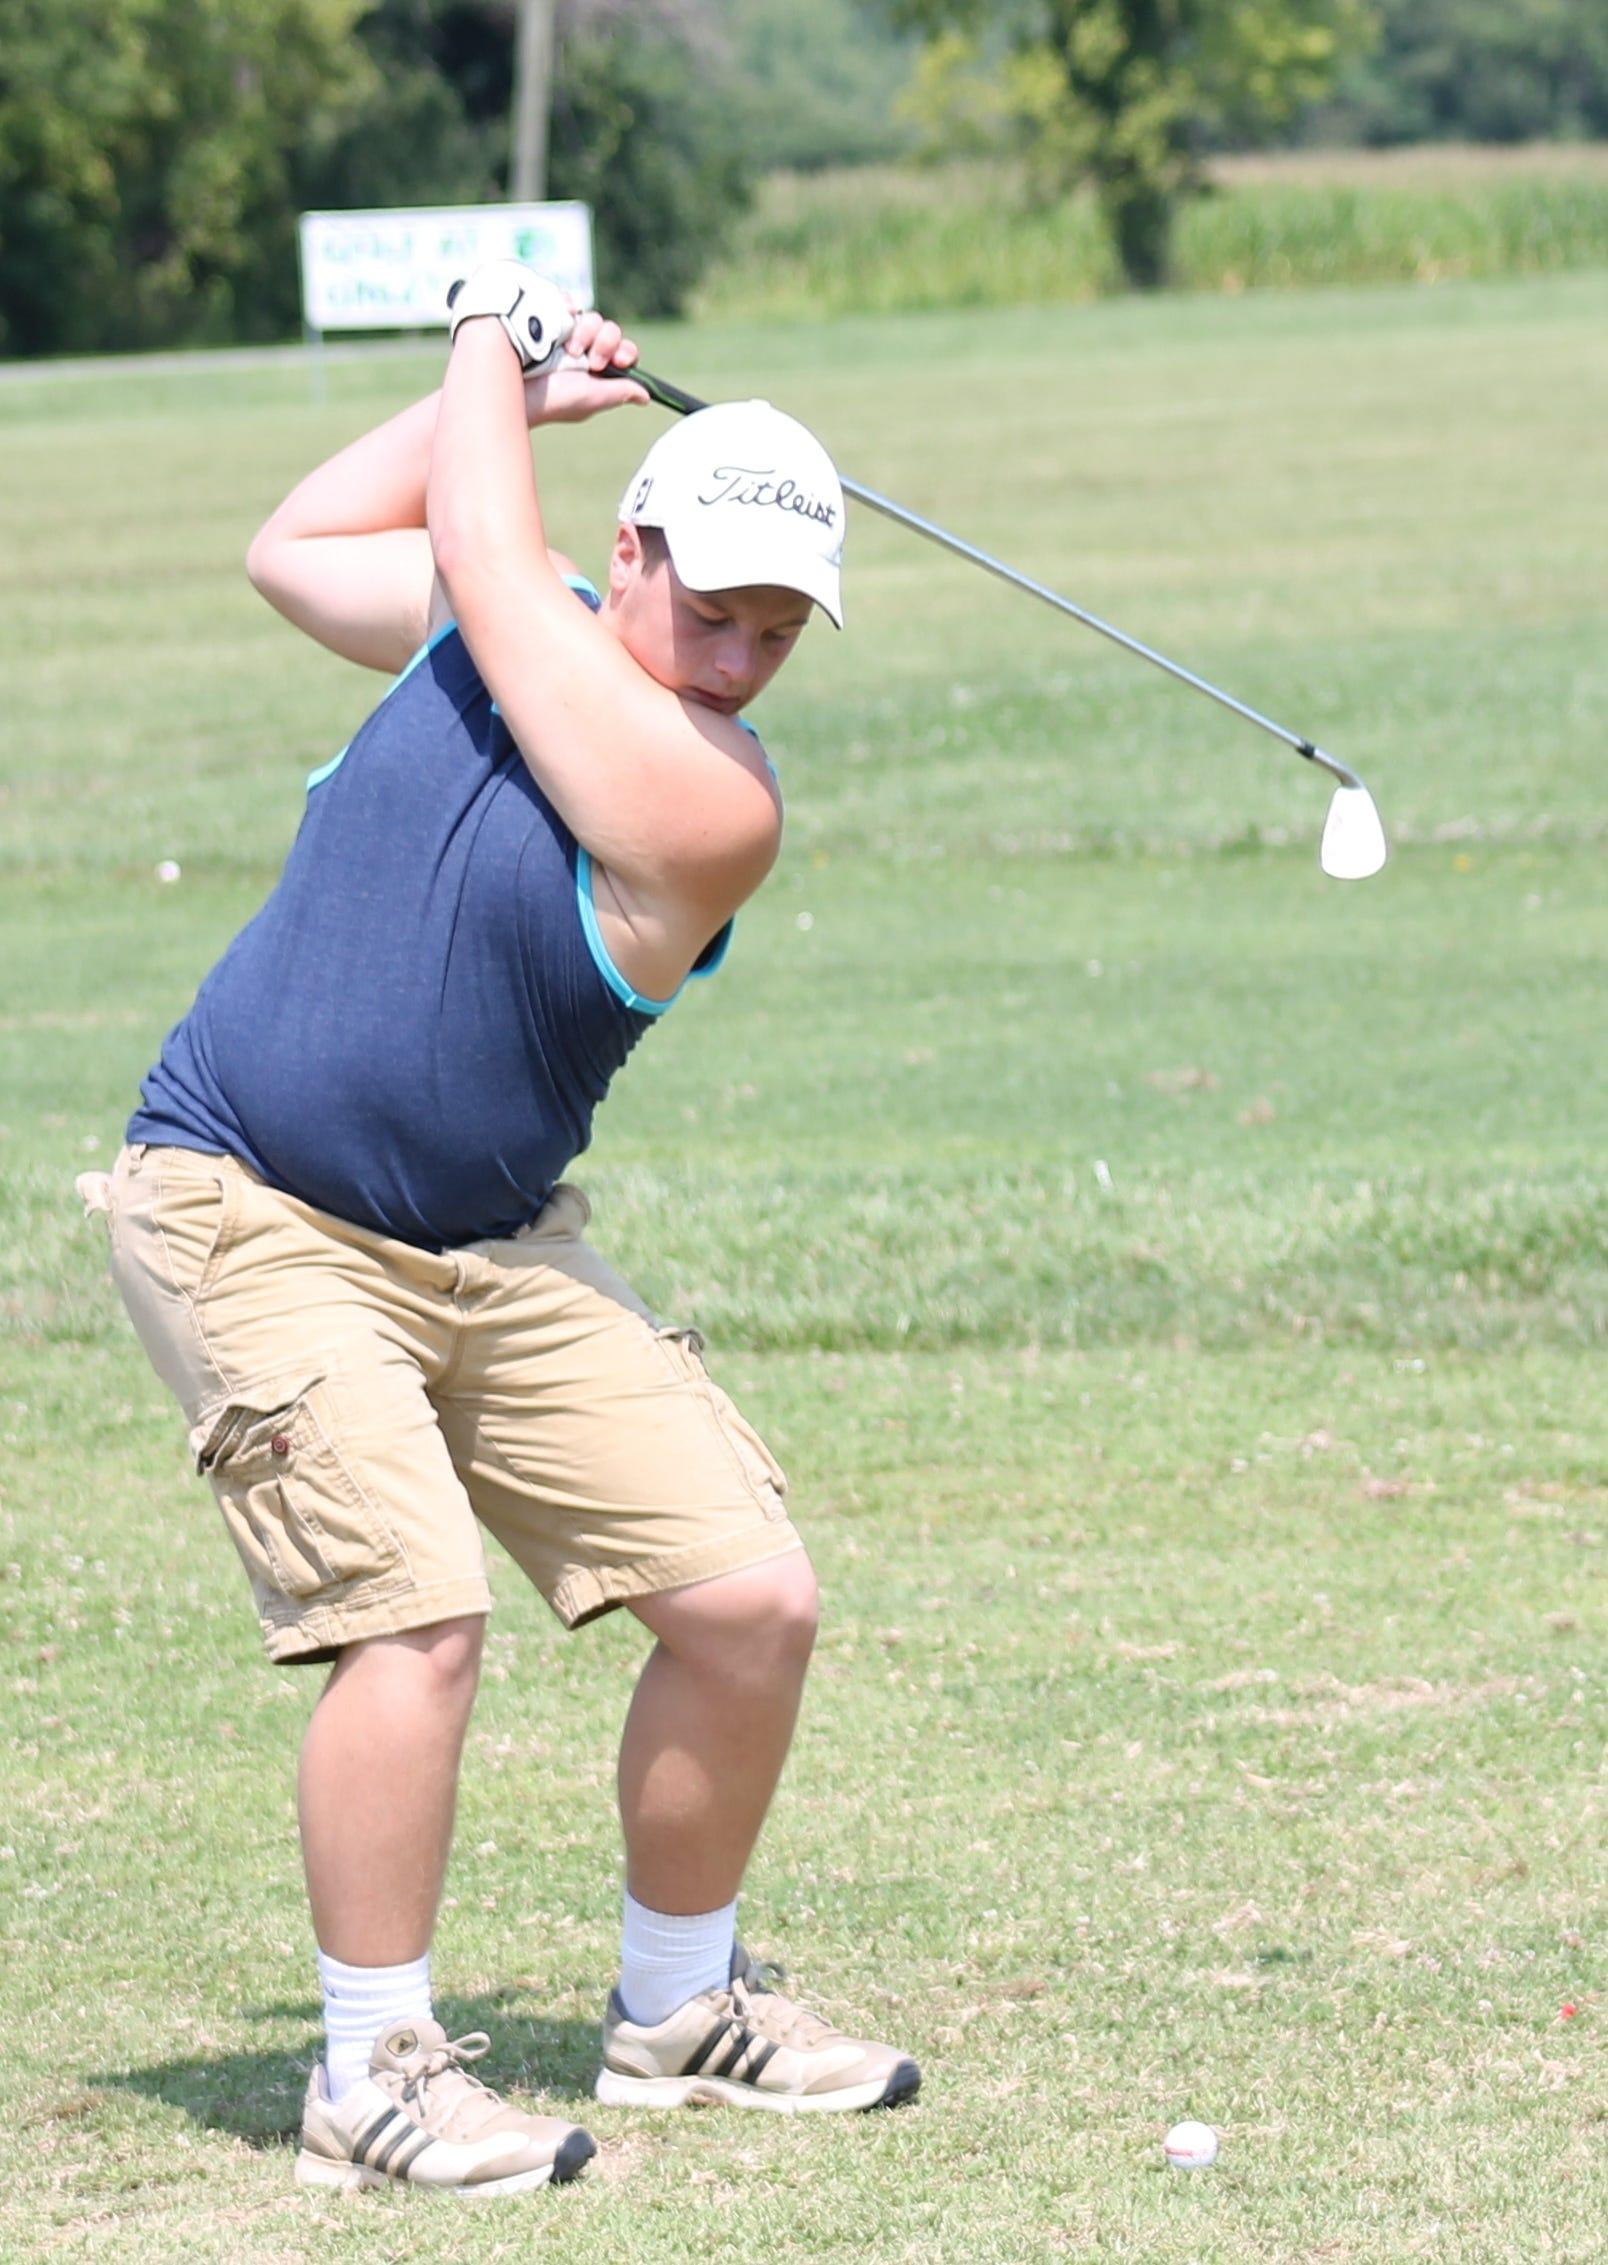 Bethel-Tate junior Jacob Dahlheimer bends the club at Friendly Meadows Aug. 1.